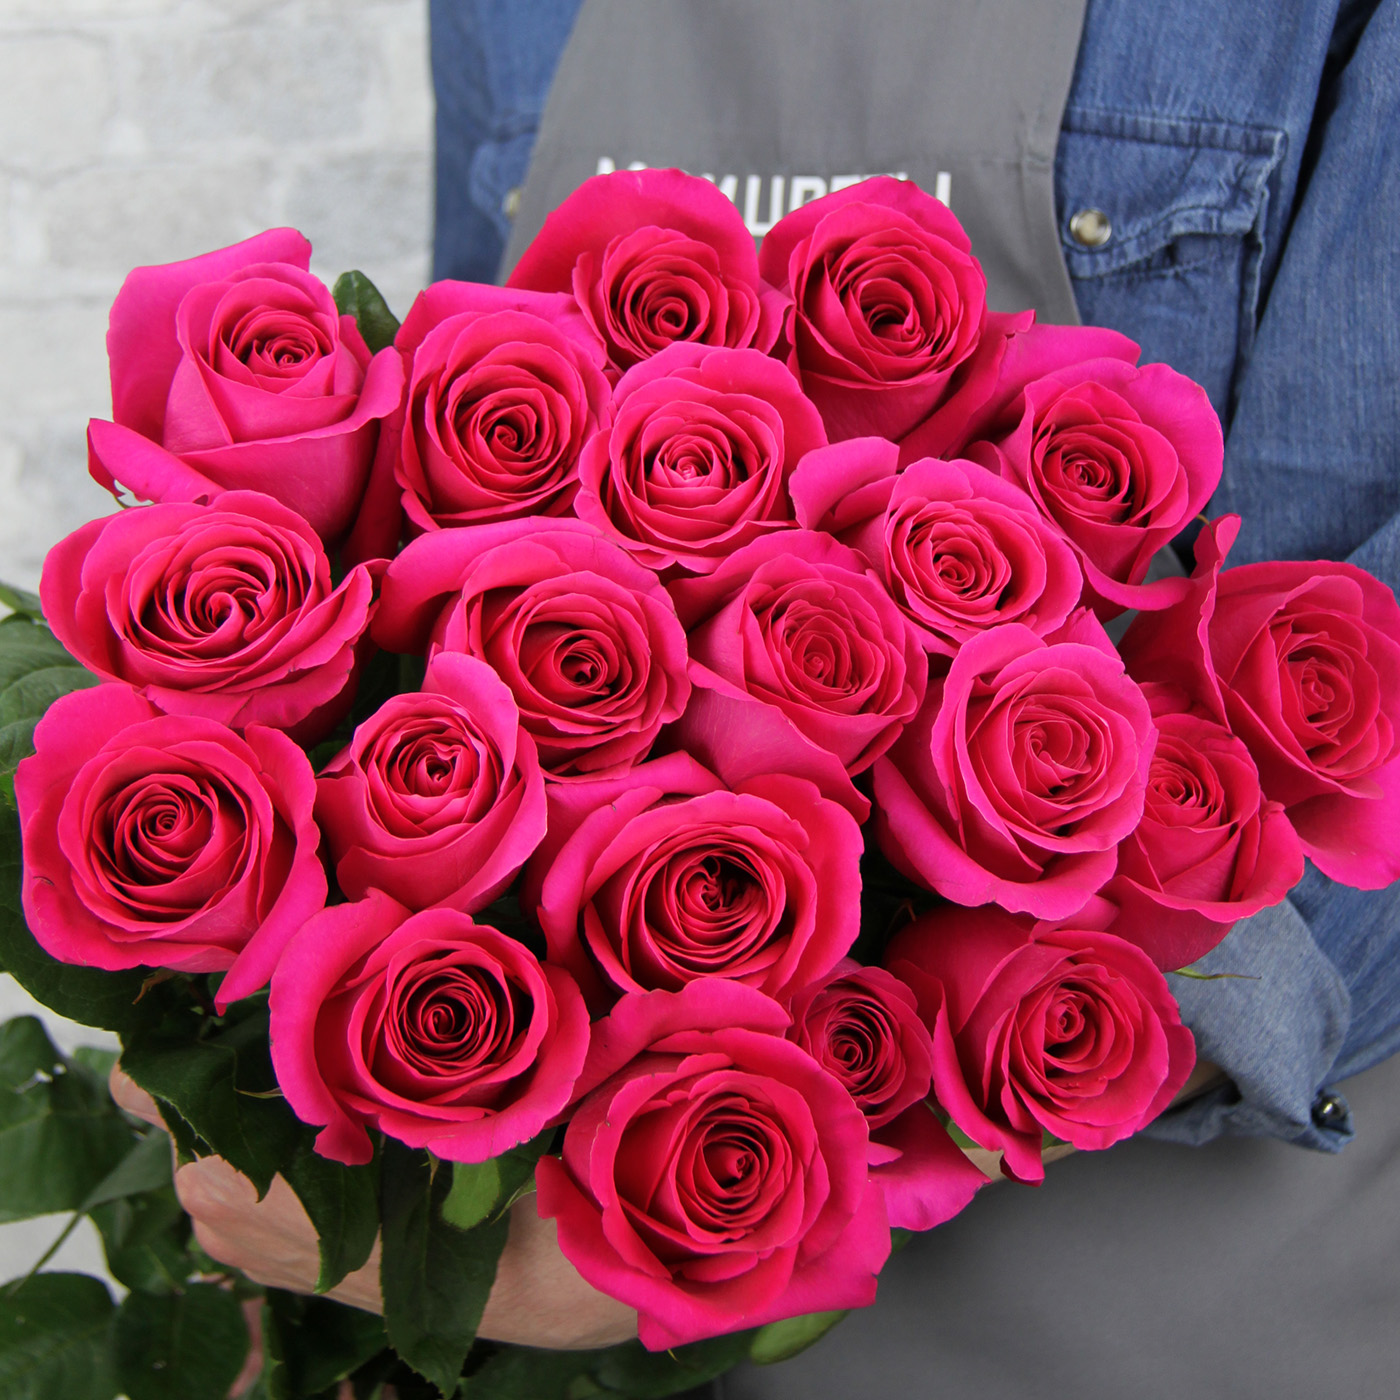 Роза «Пинк Флойд», Эквадор